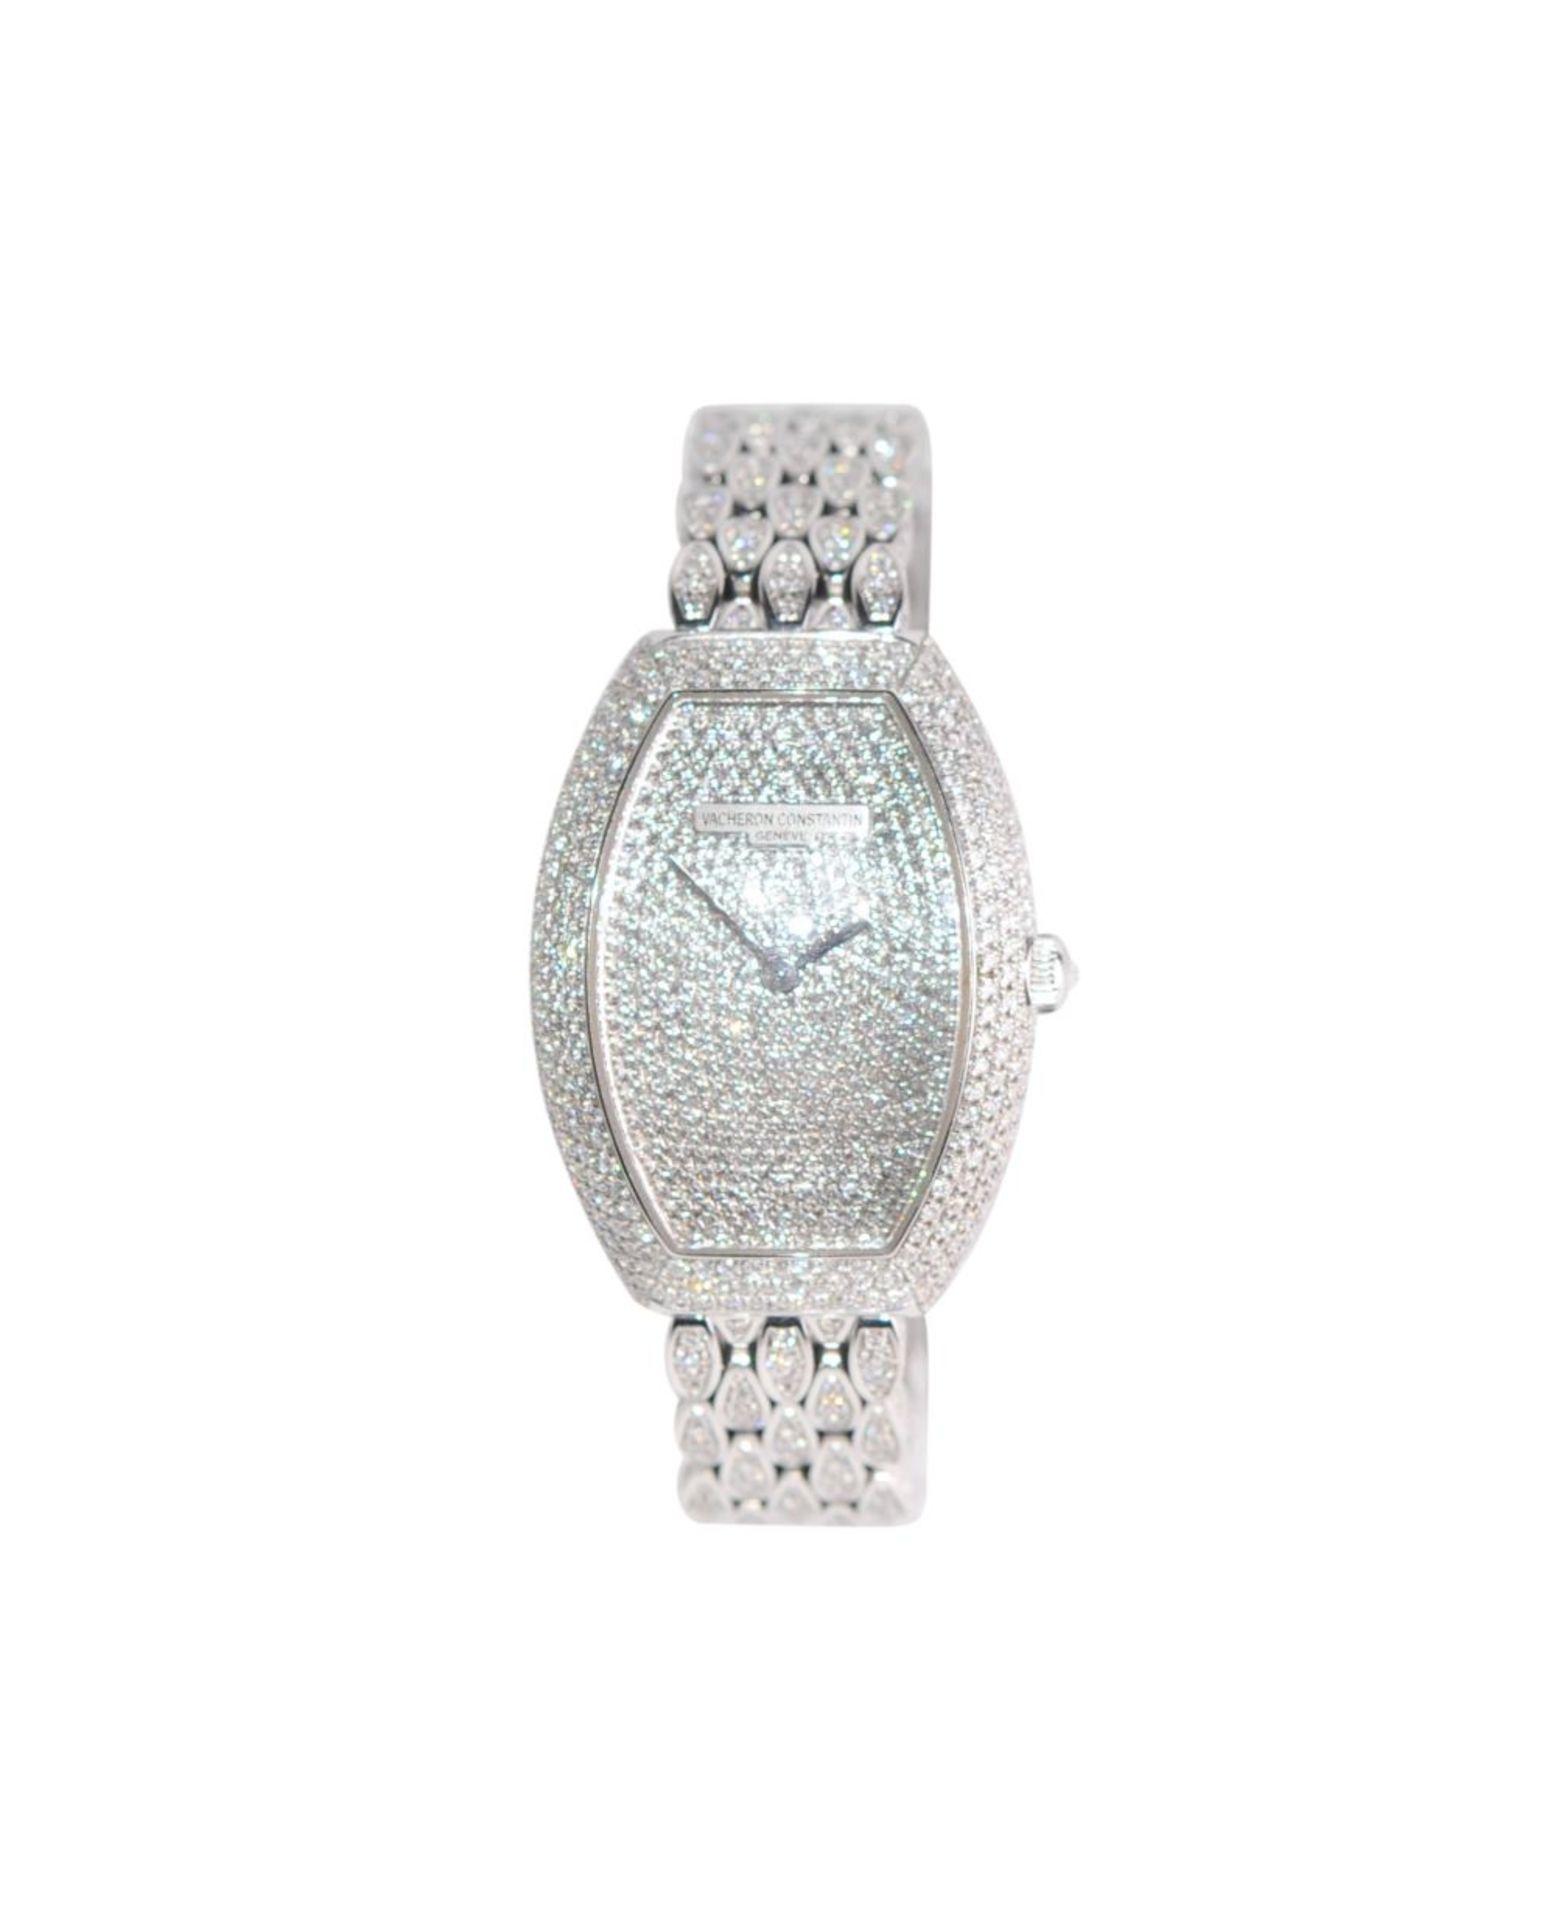 Los 30 - Vacheron Constantin Ladies Timepieces - Egérie full DaimondExclusive brilliant ladies watch Vacheron